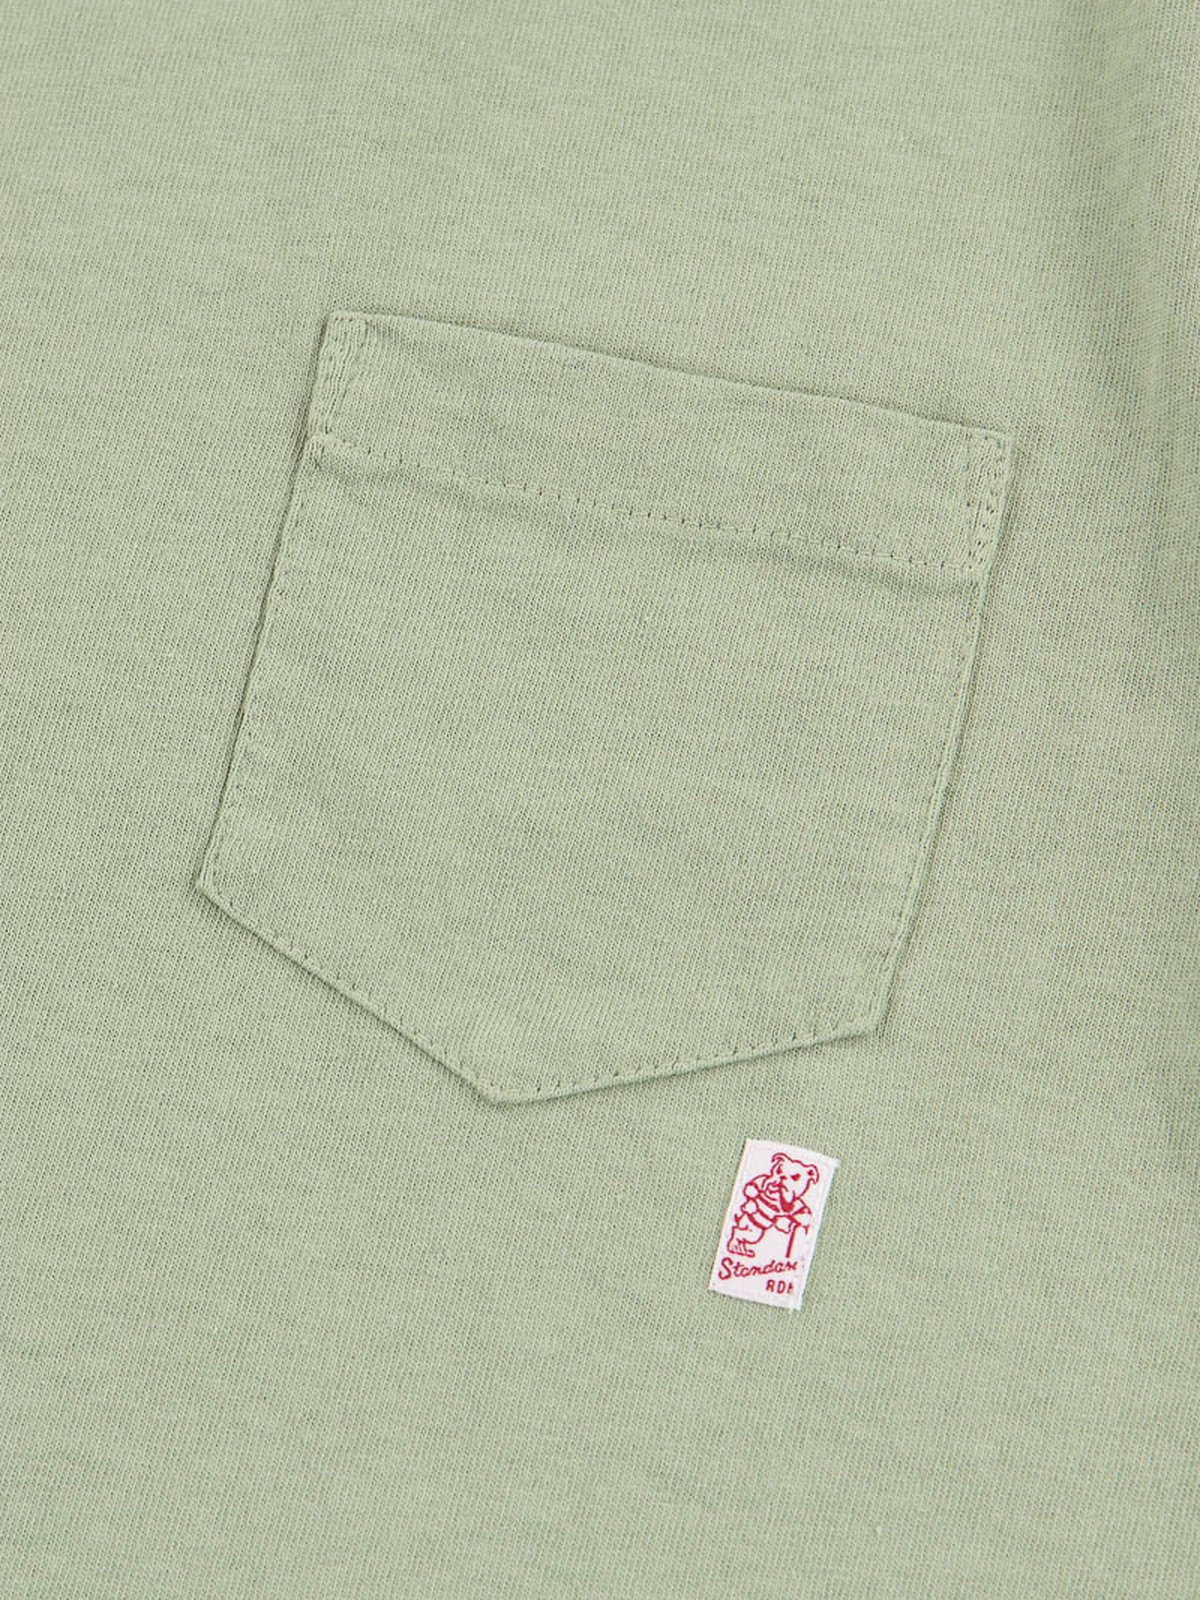 Green Standard Pack Pocket Tee - Image 3